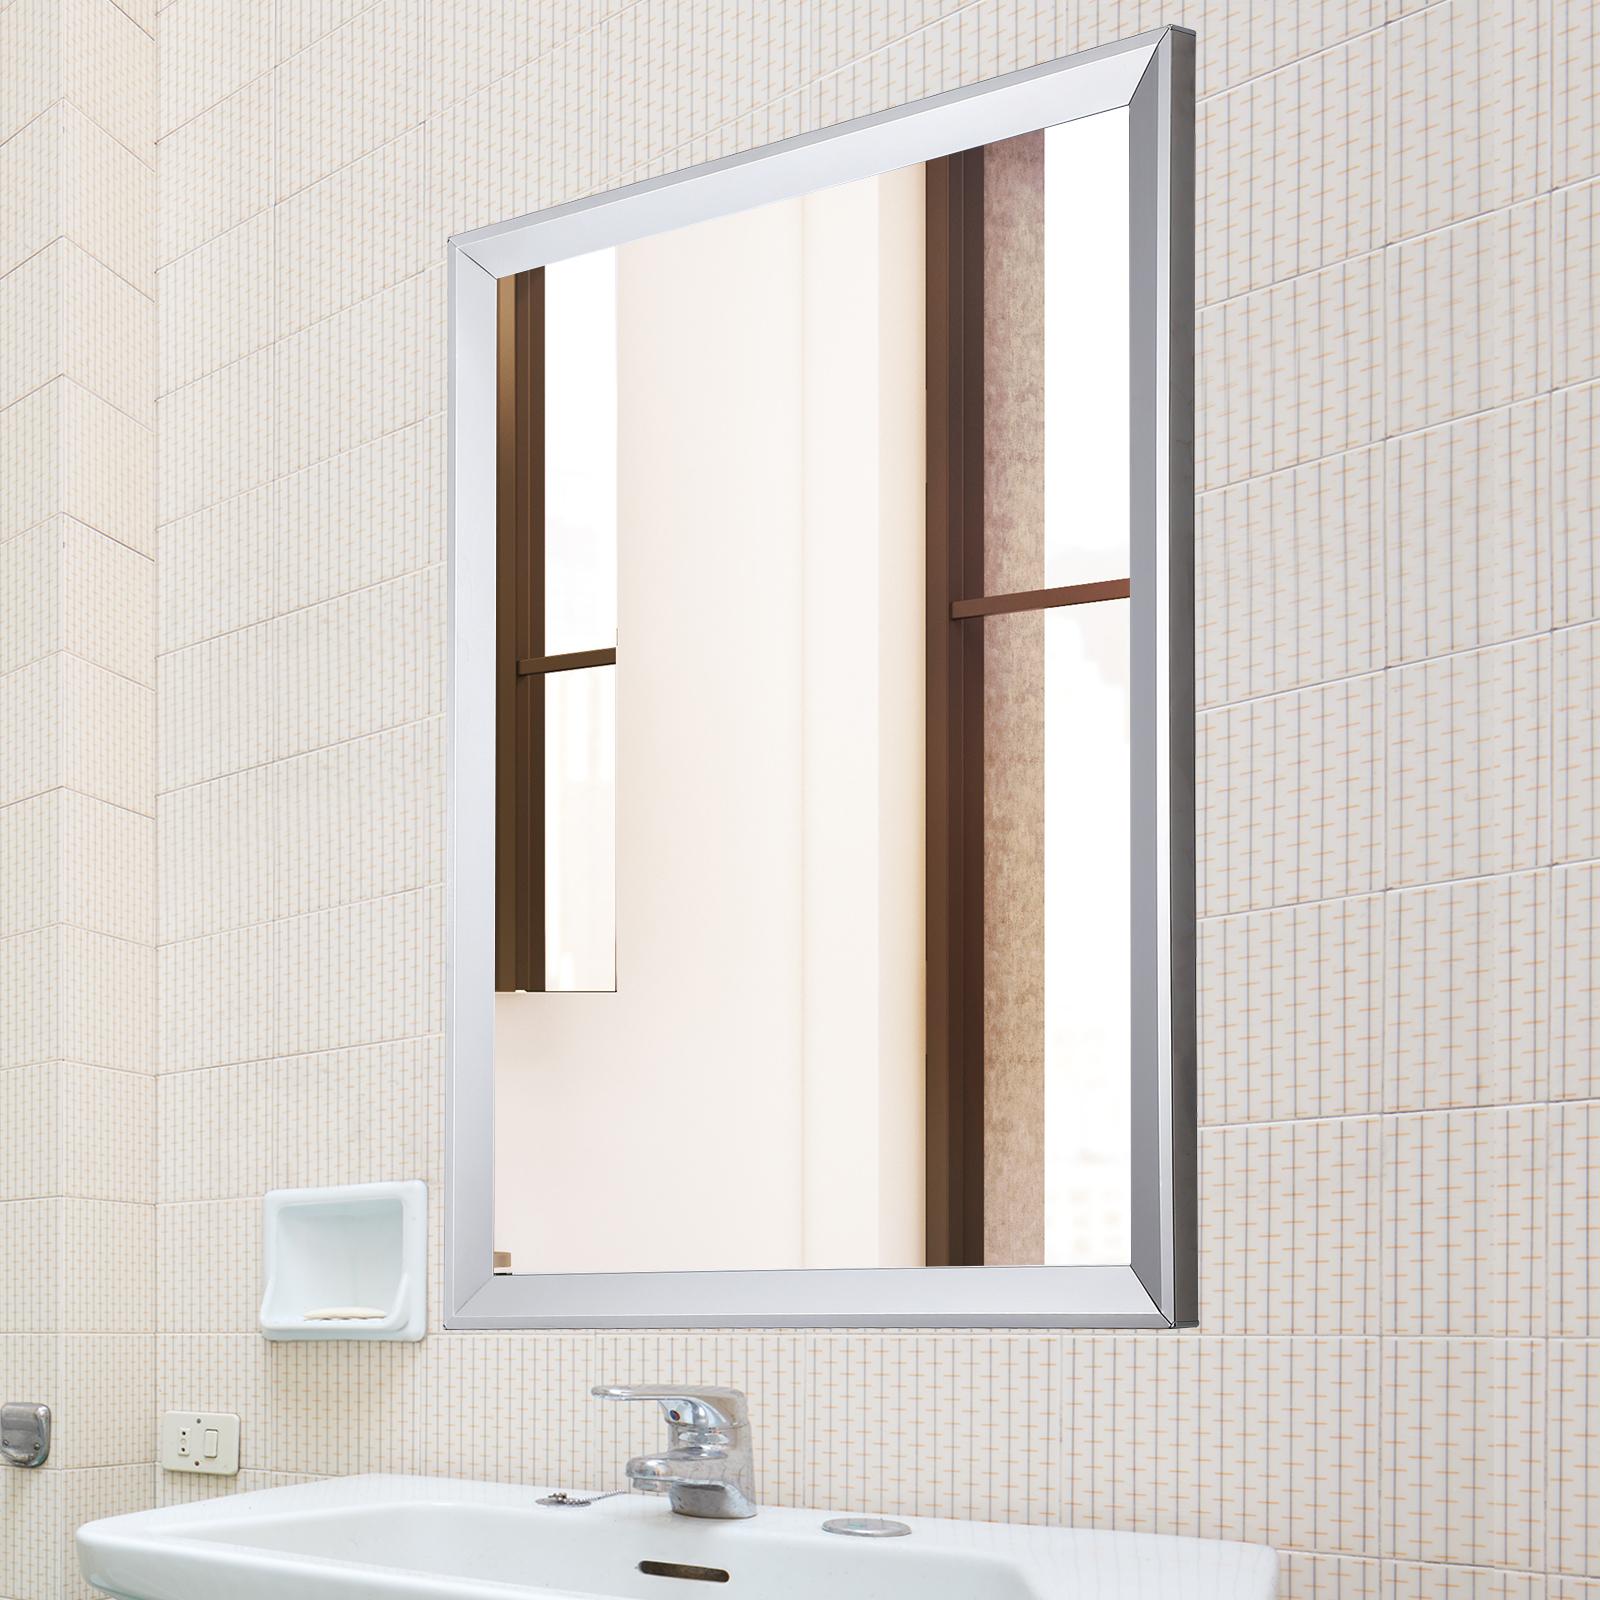 Decorative Mirrors Frameless Rectangle Bathroom Glas Look